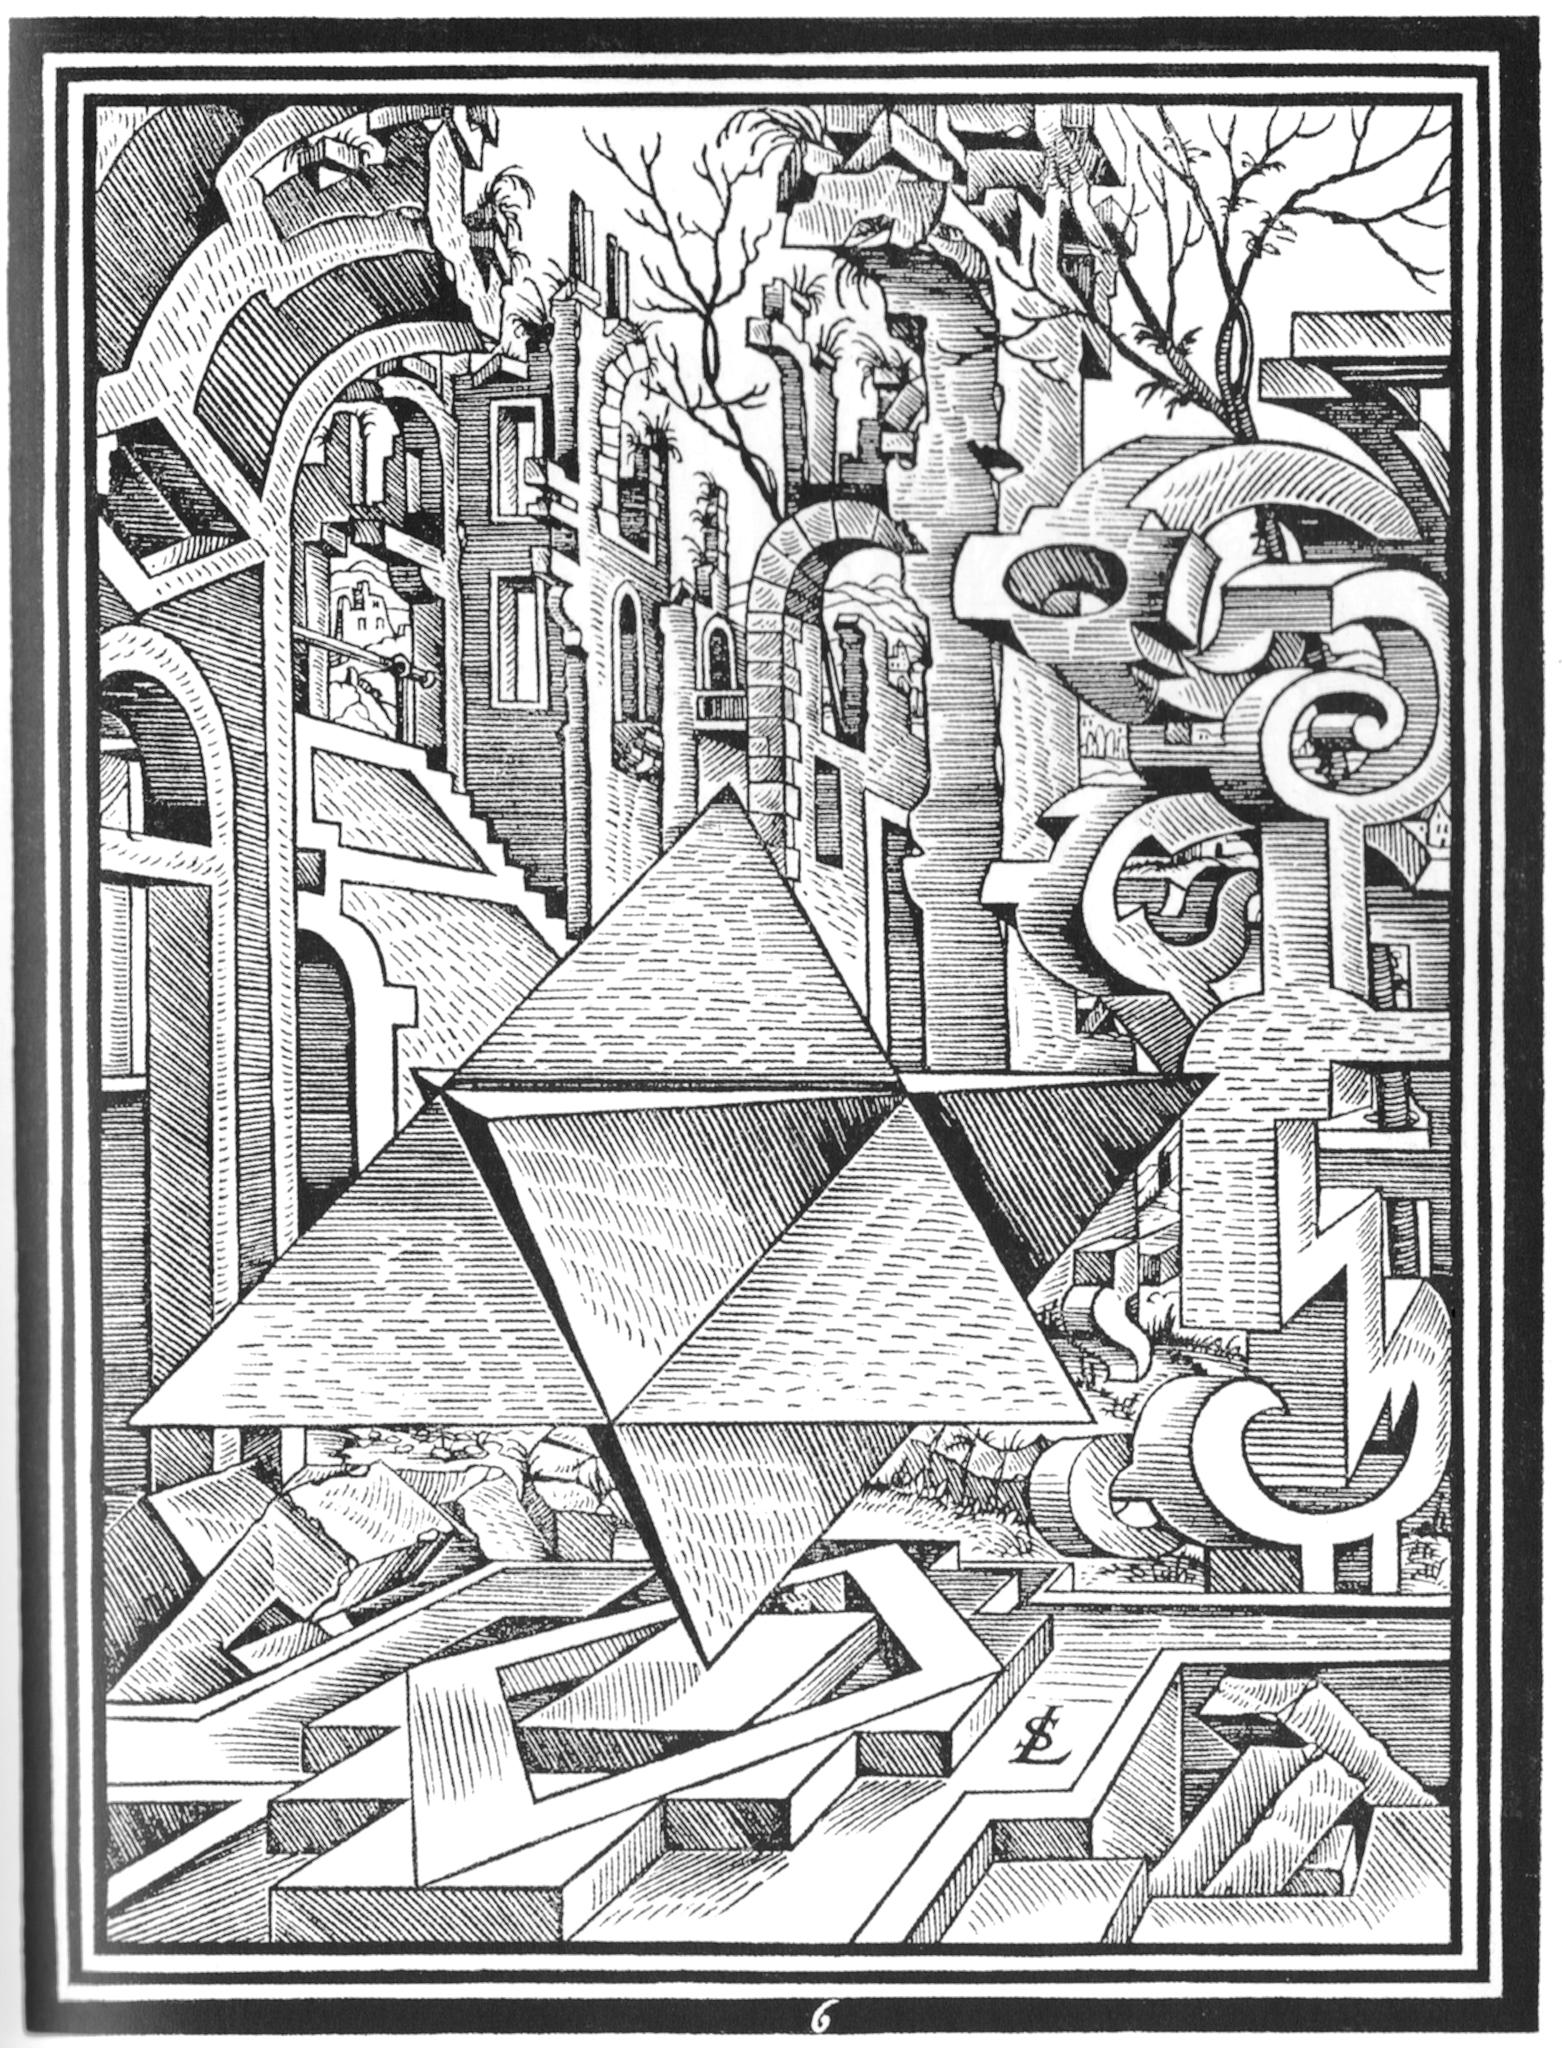 Lorenz Stoers postapokalyptiske ruinlandskap med geometriske figurer.